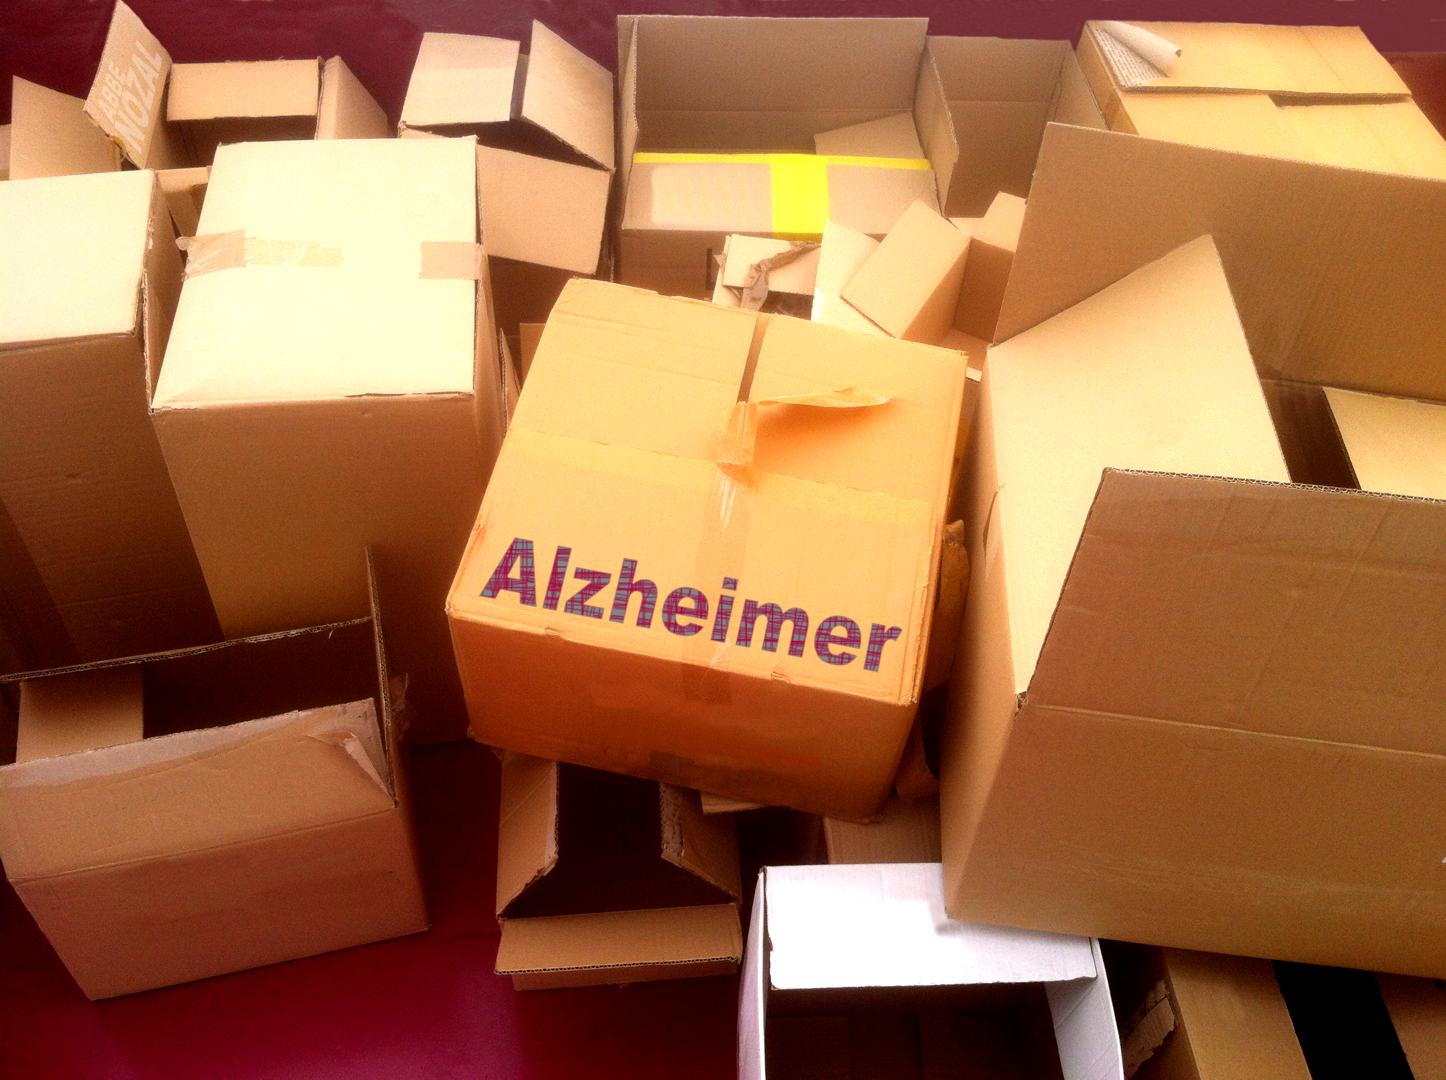 Alzheimer, 2014 Abbé Nozal